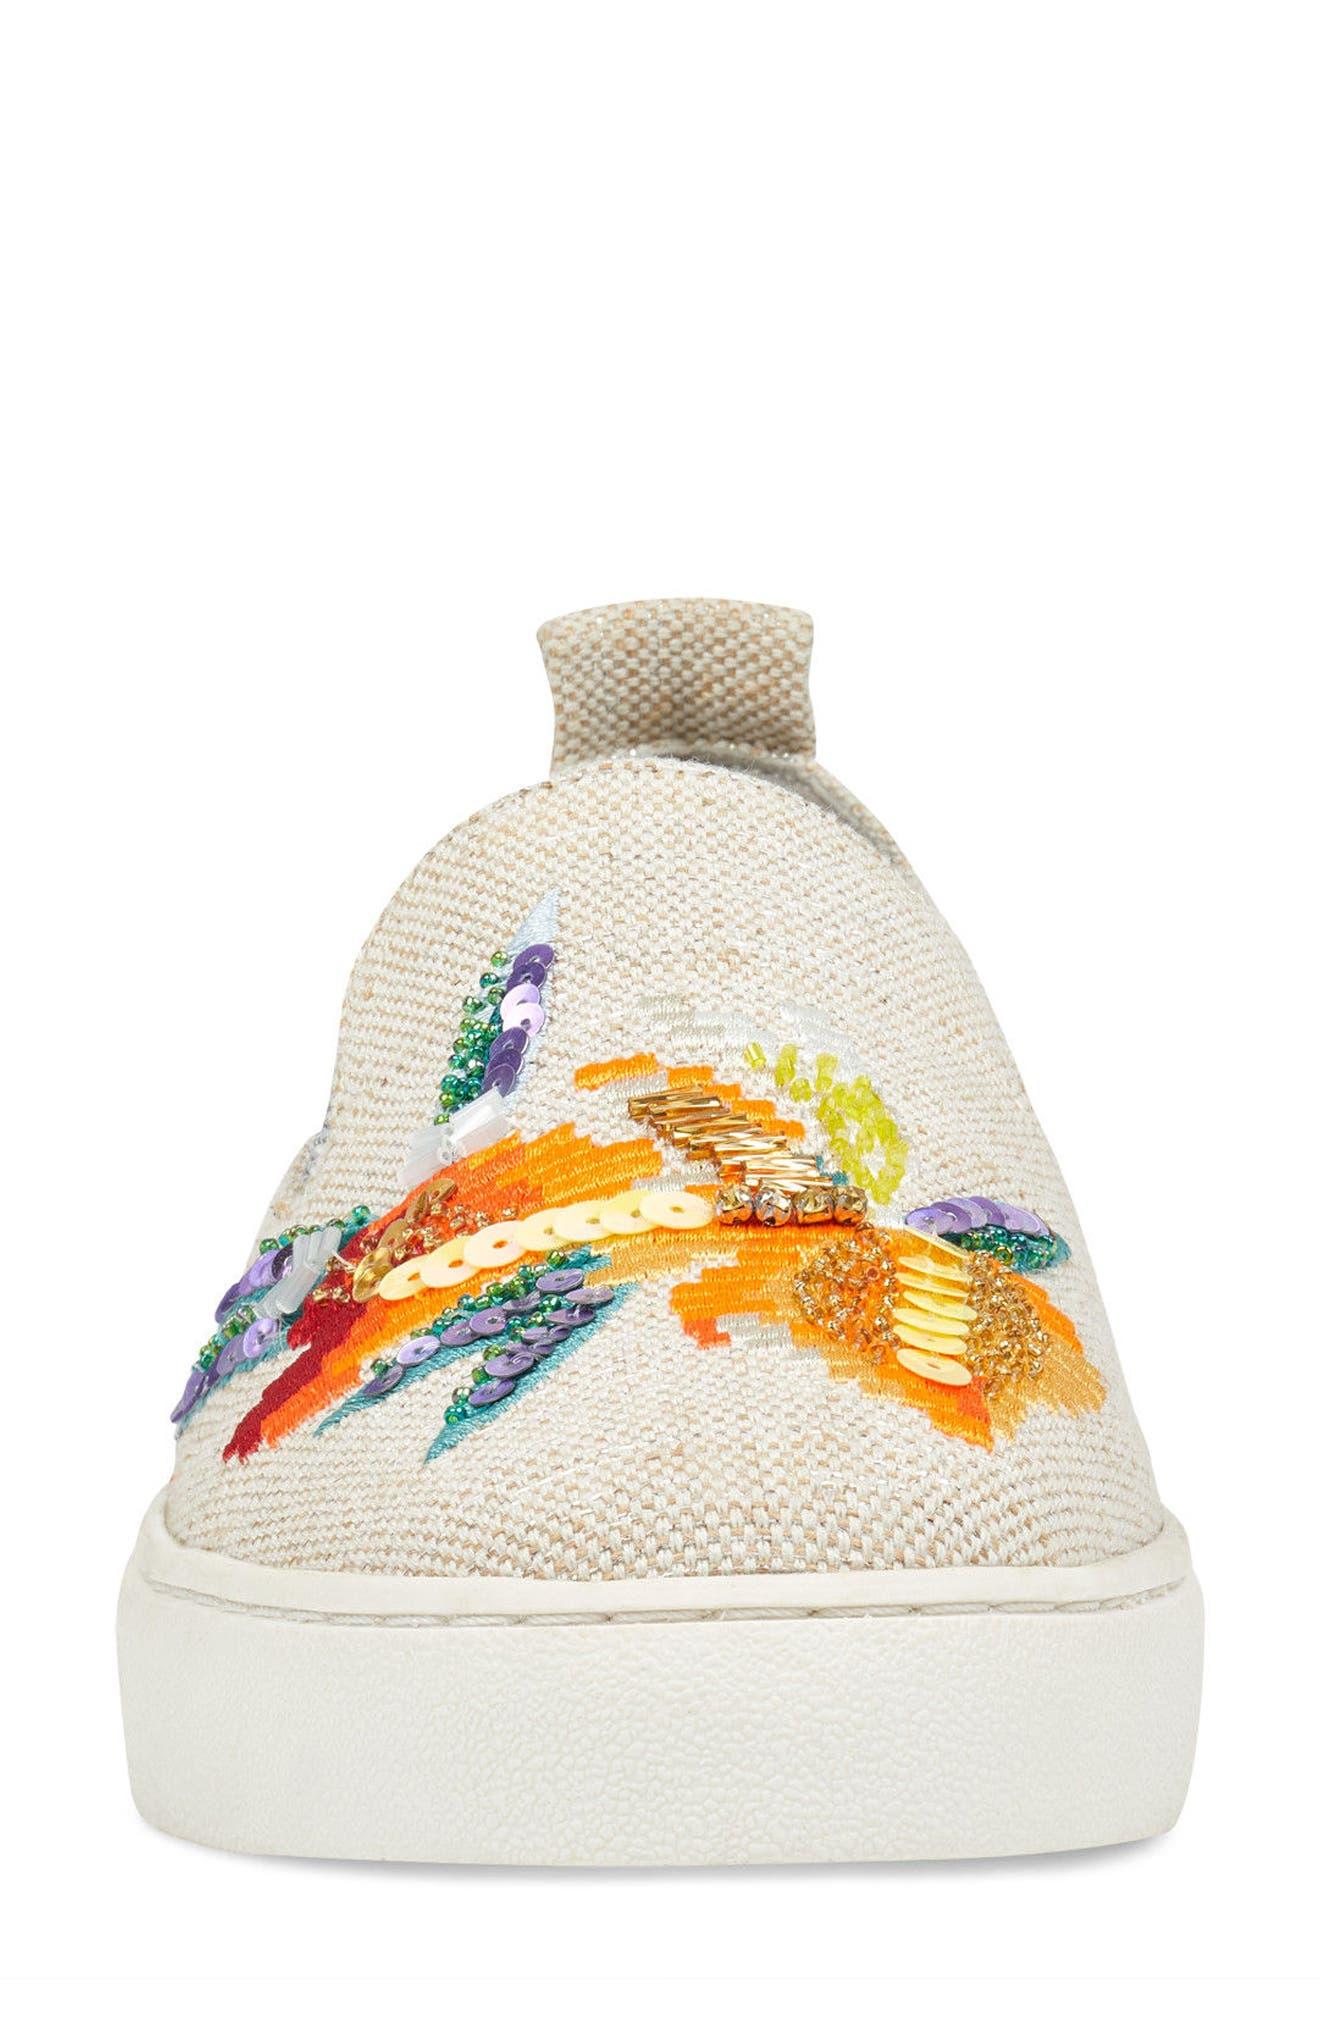 Playavista Slip-On Sneaker,                             Alternate thumbnail 4, color,                             270